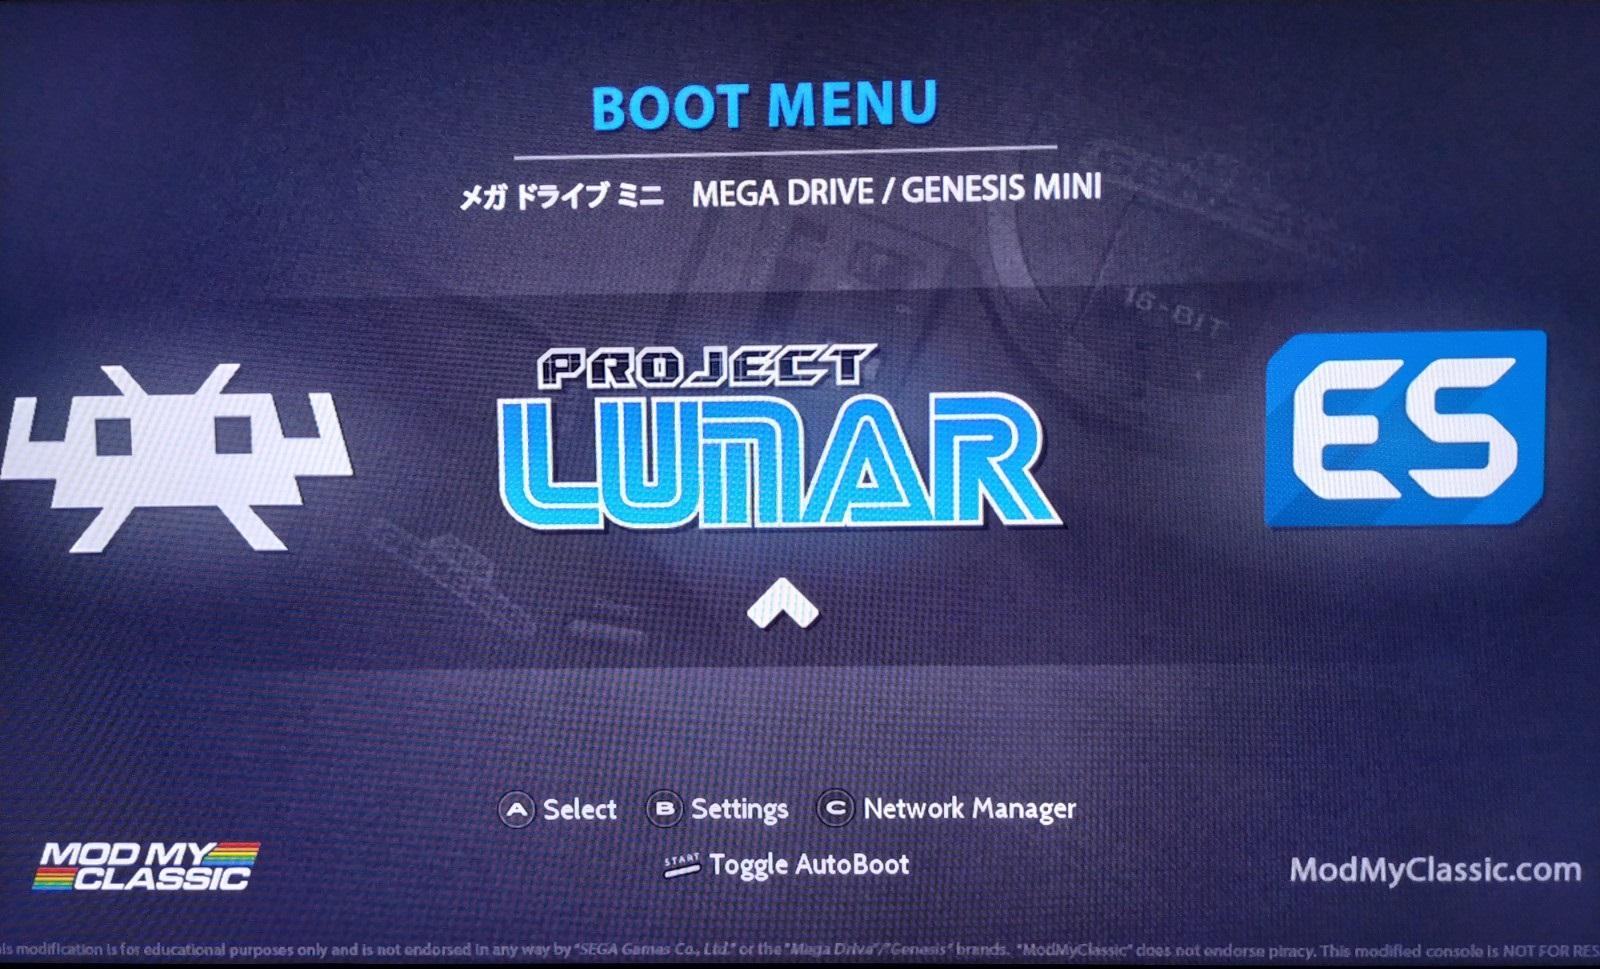 Tutorial Para Instalar Y Configurar Project Lunar En Megadrive Mini